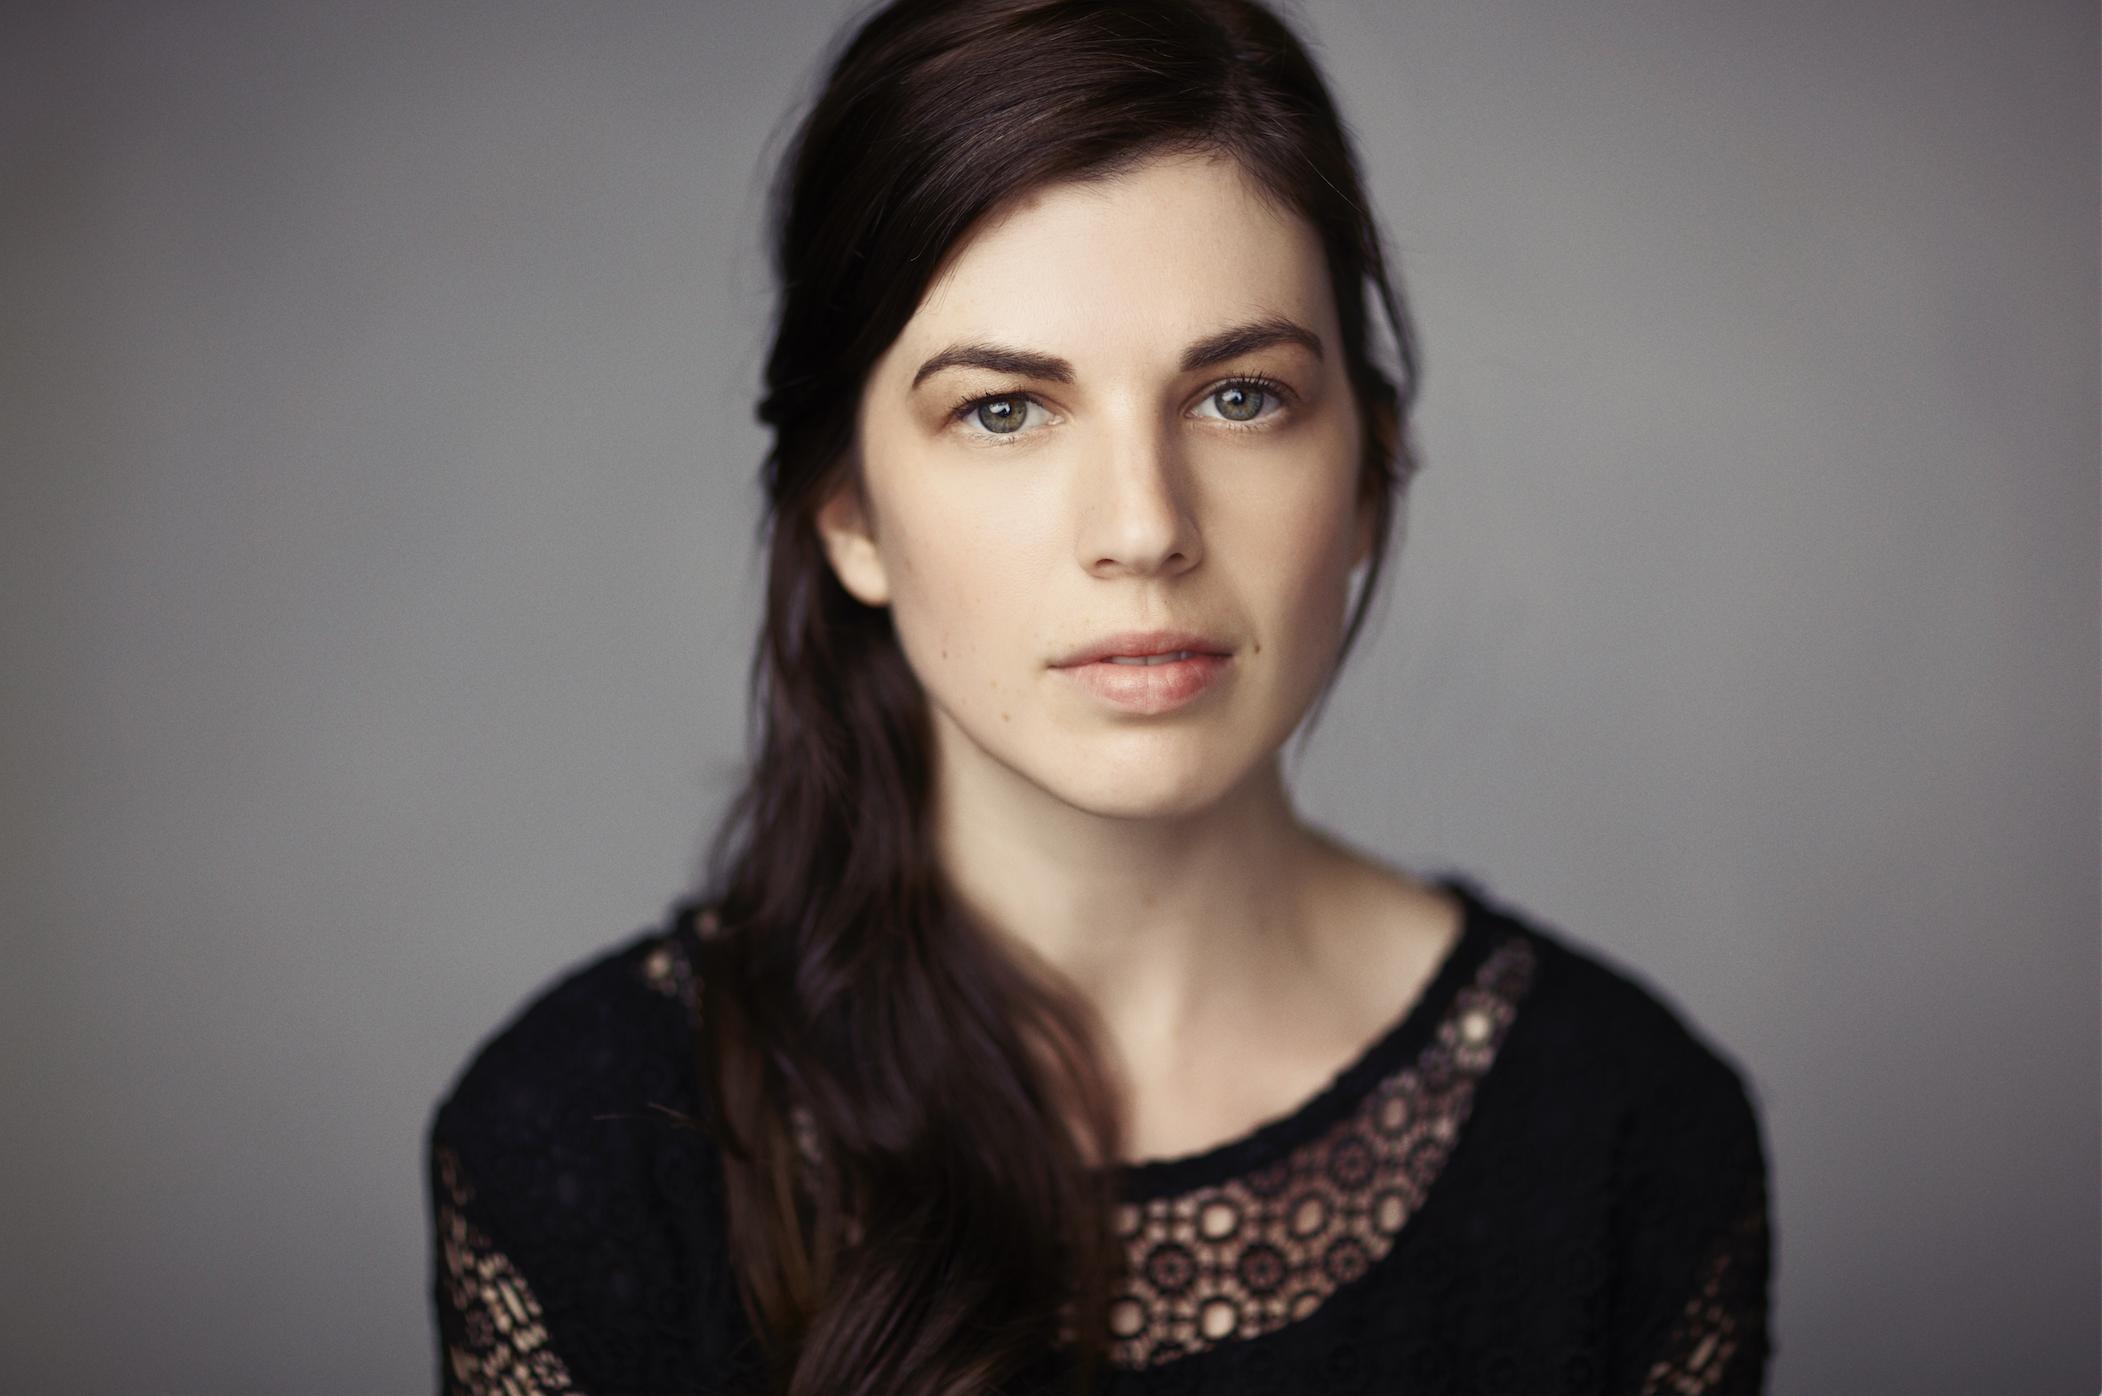 Talia Zucker